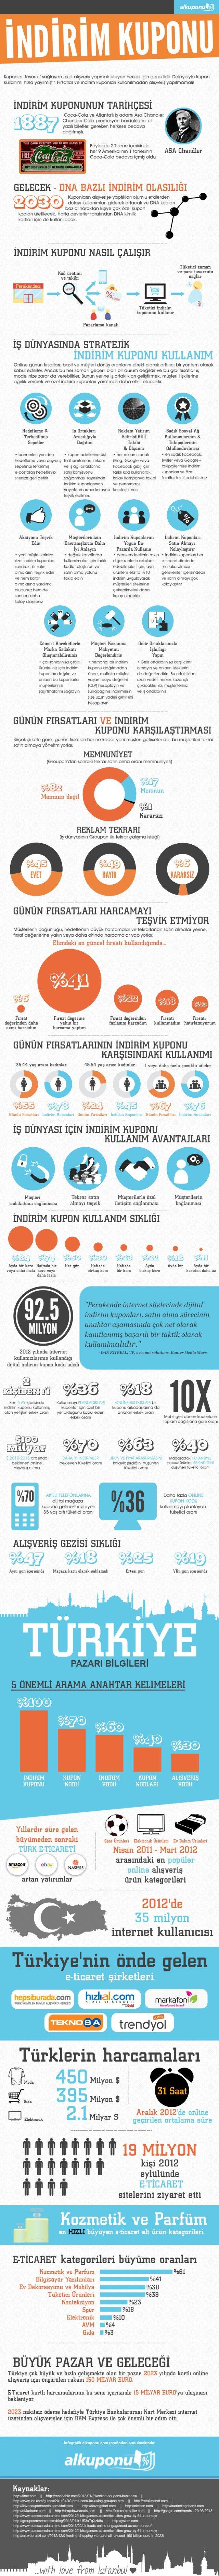 indirim_kuponu_turkiye_pazari_2013